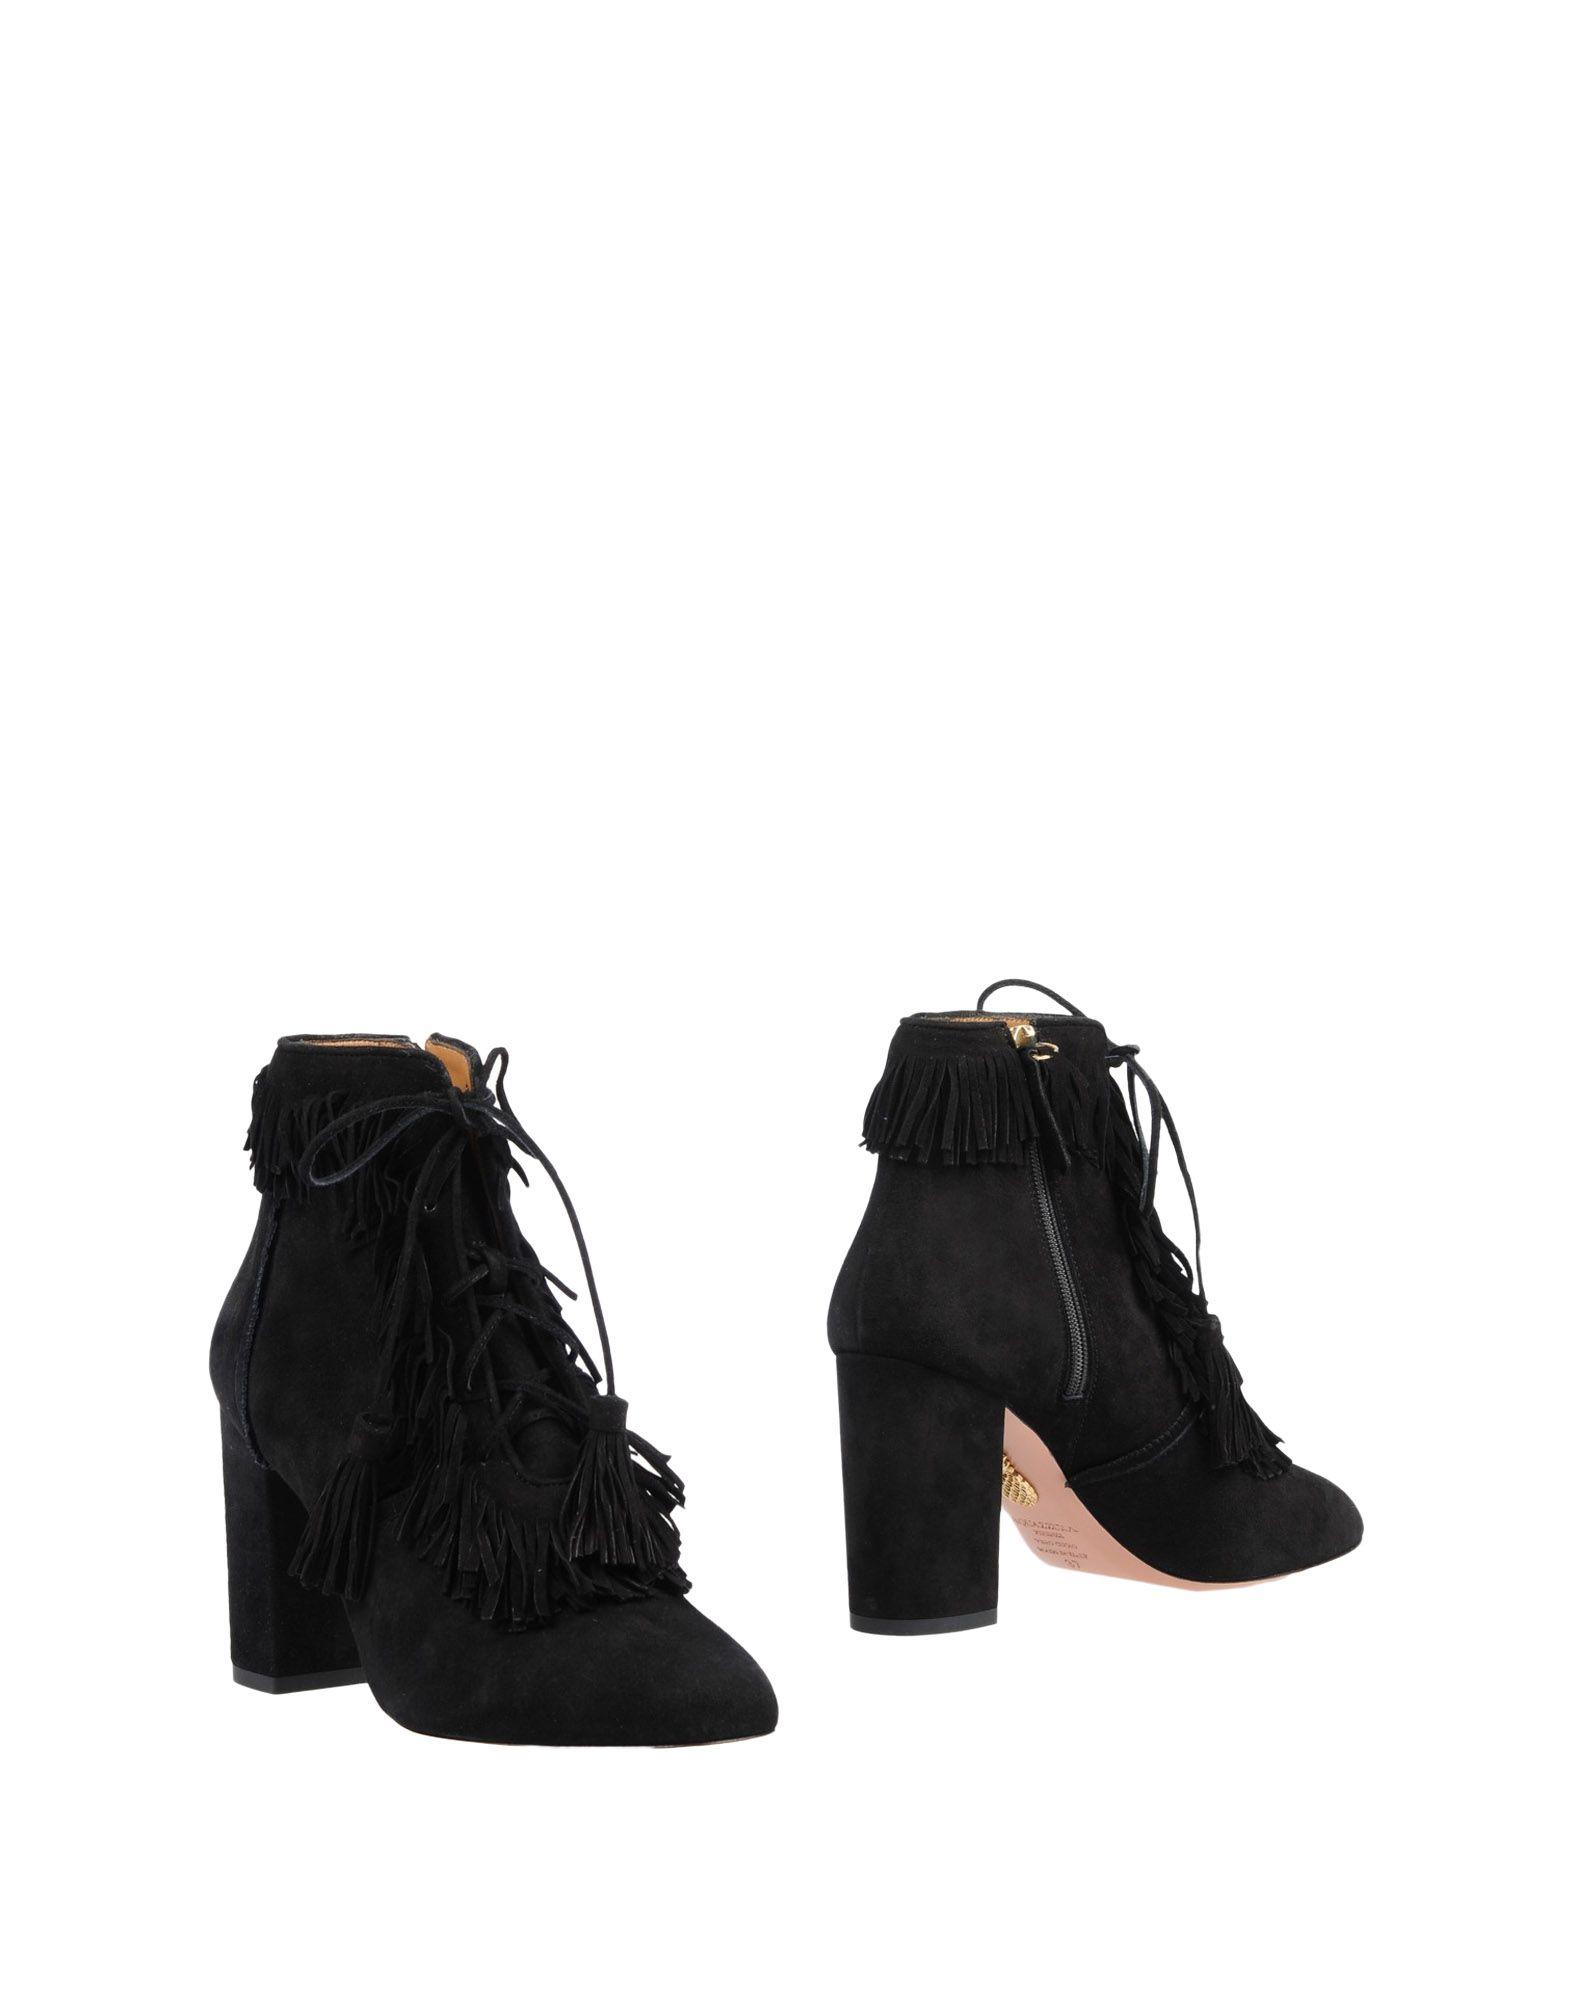 Aquazzura 11417154LMGünstige Stiefelette Damen 11417154LMGünstige Aquazzura gut aussehende Schuhe d7b137